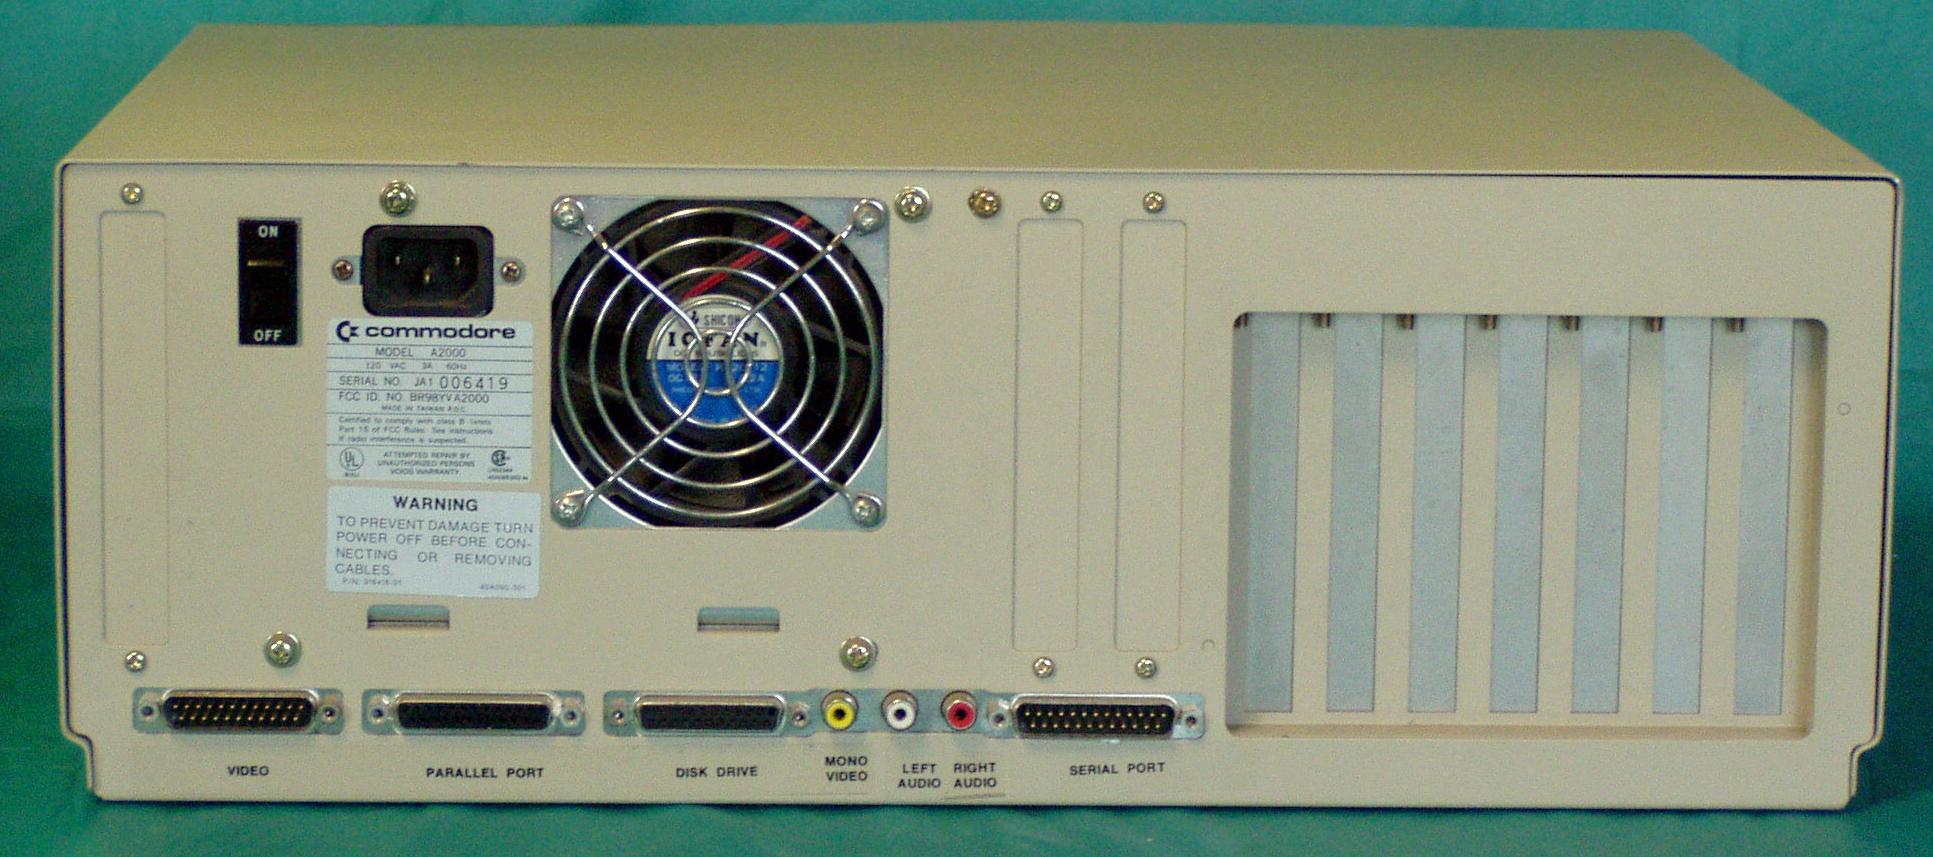 DAVES OLD COMPUTERS - Commodore Amiga